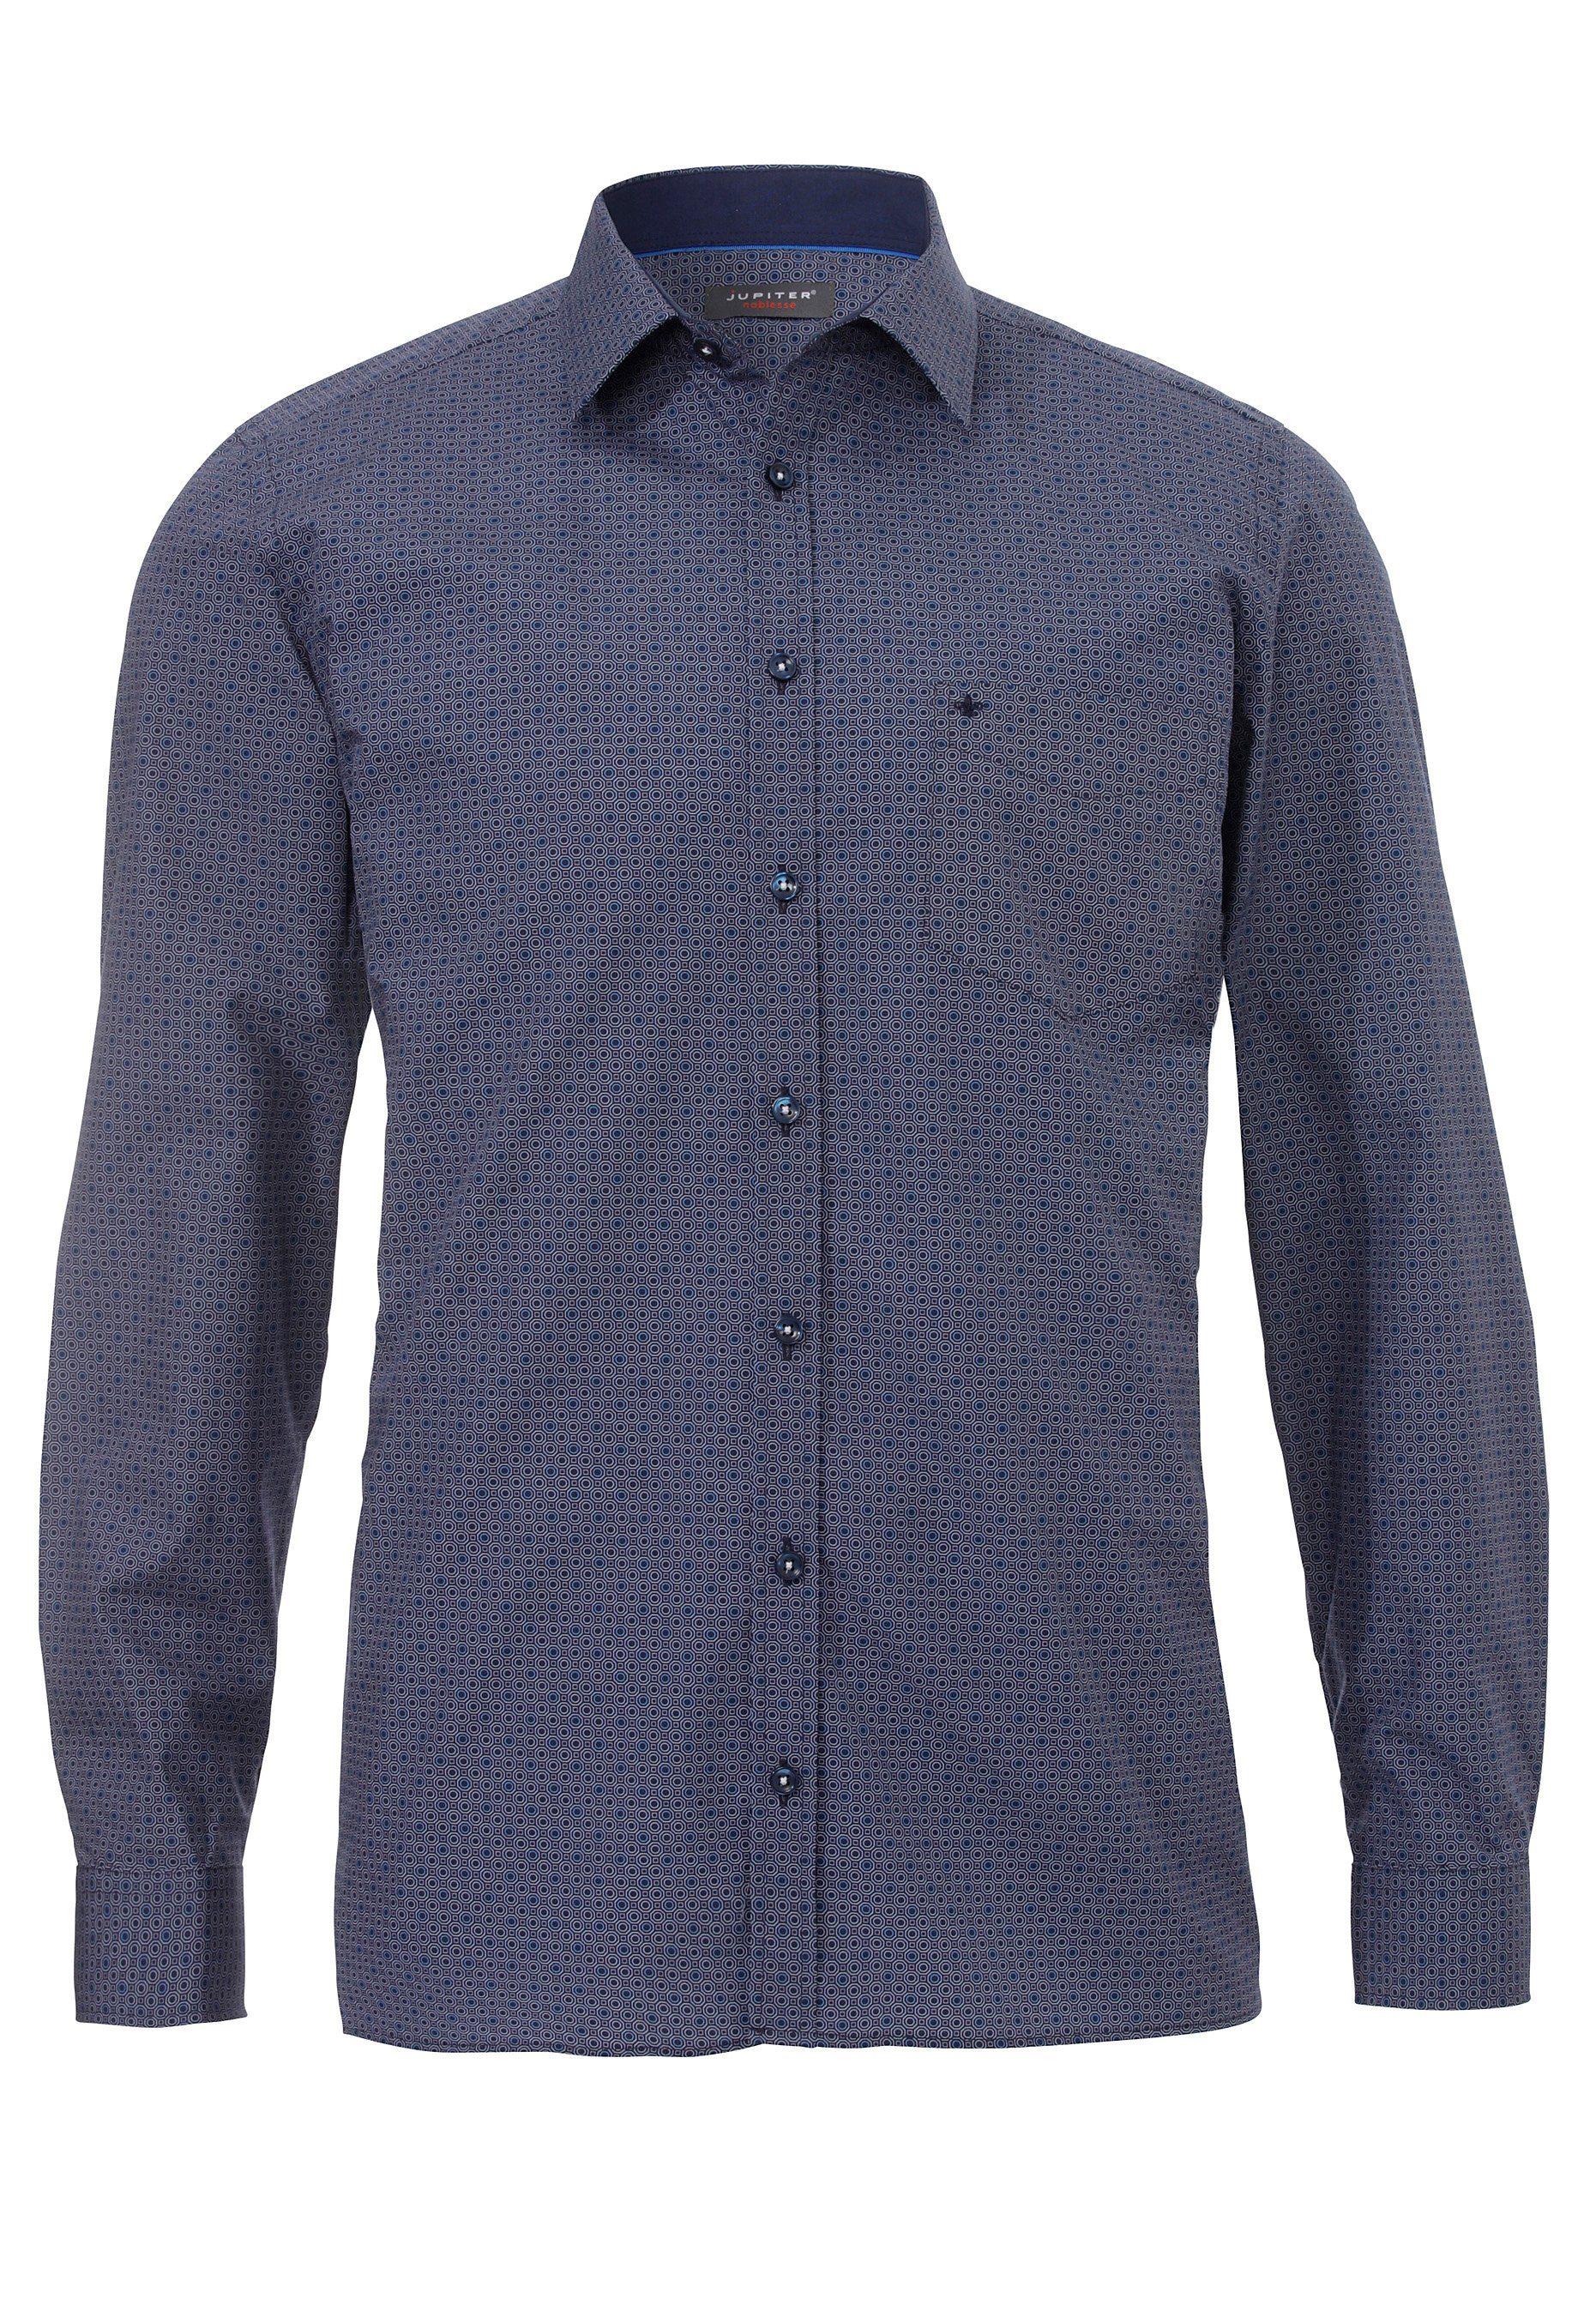 Jupiter Attraktives figurbetontes Langarmhemd   Bekleidung > Hemden > Sonstige Hemden   Blau   Jeans - Baumwolle   Jupiter